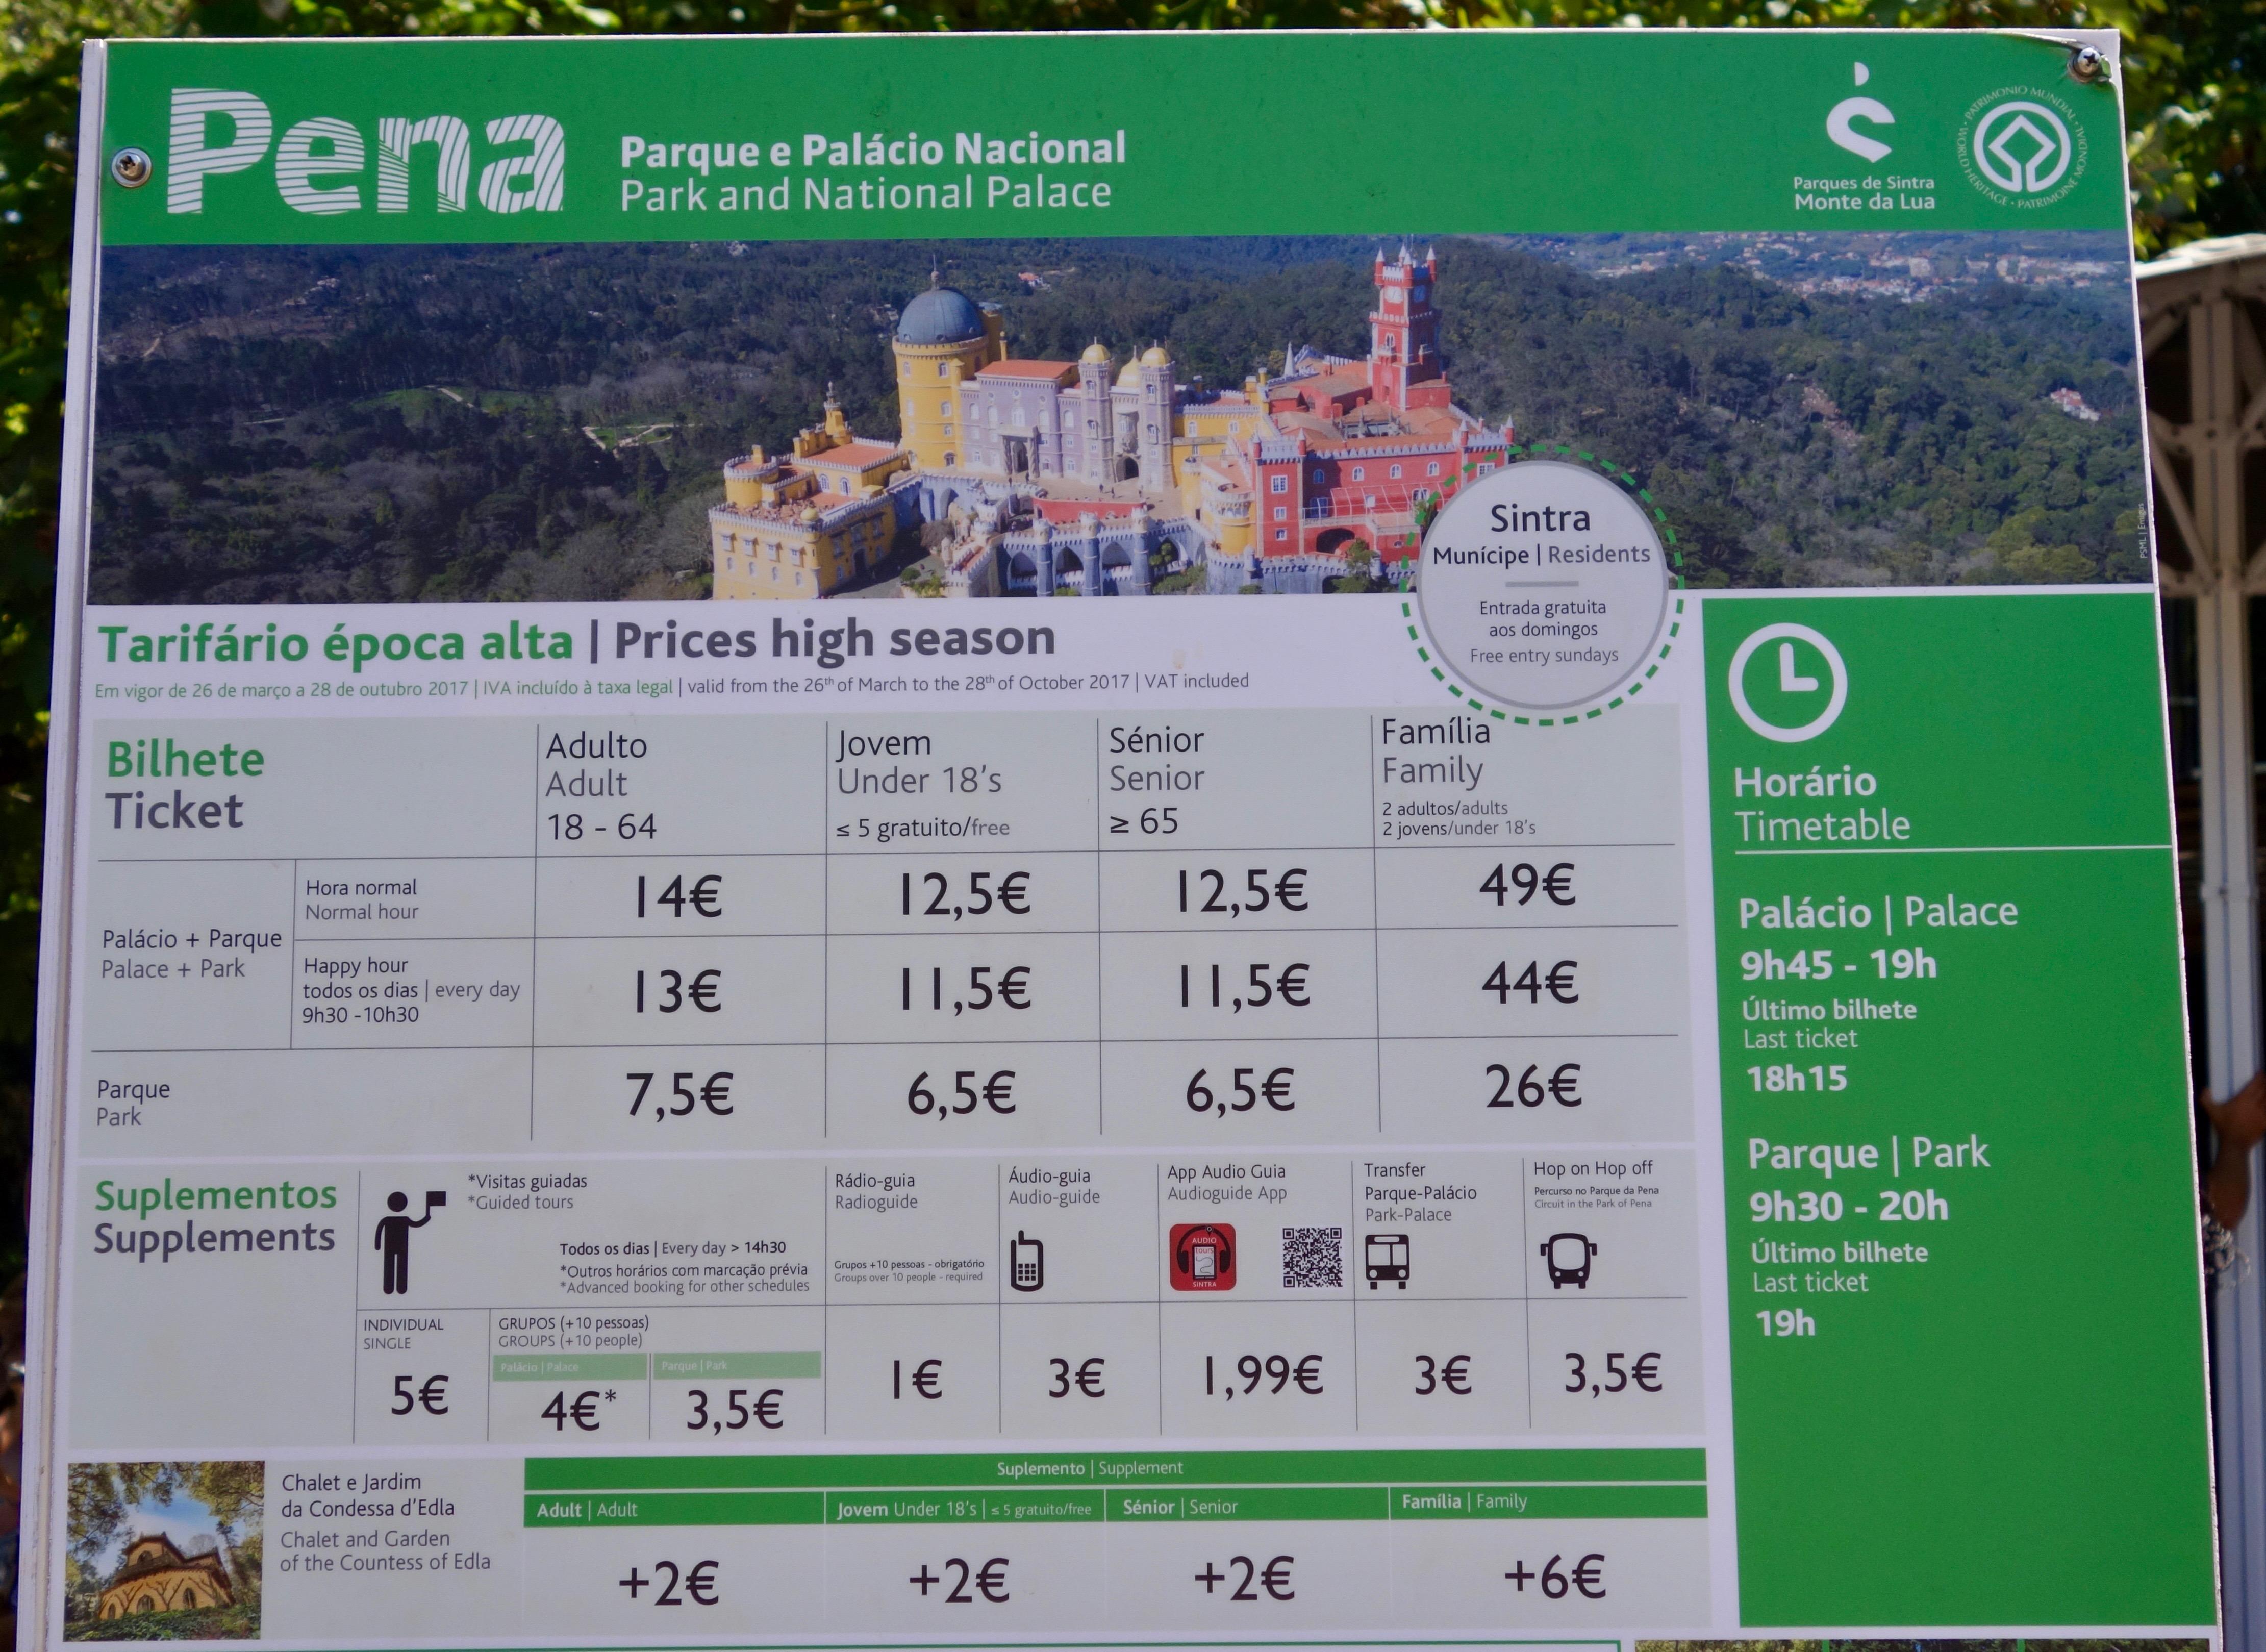 Sintra : Palácio da Pena (UNESCO Weltkulturerbe) Ticketpreise